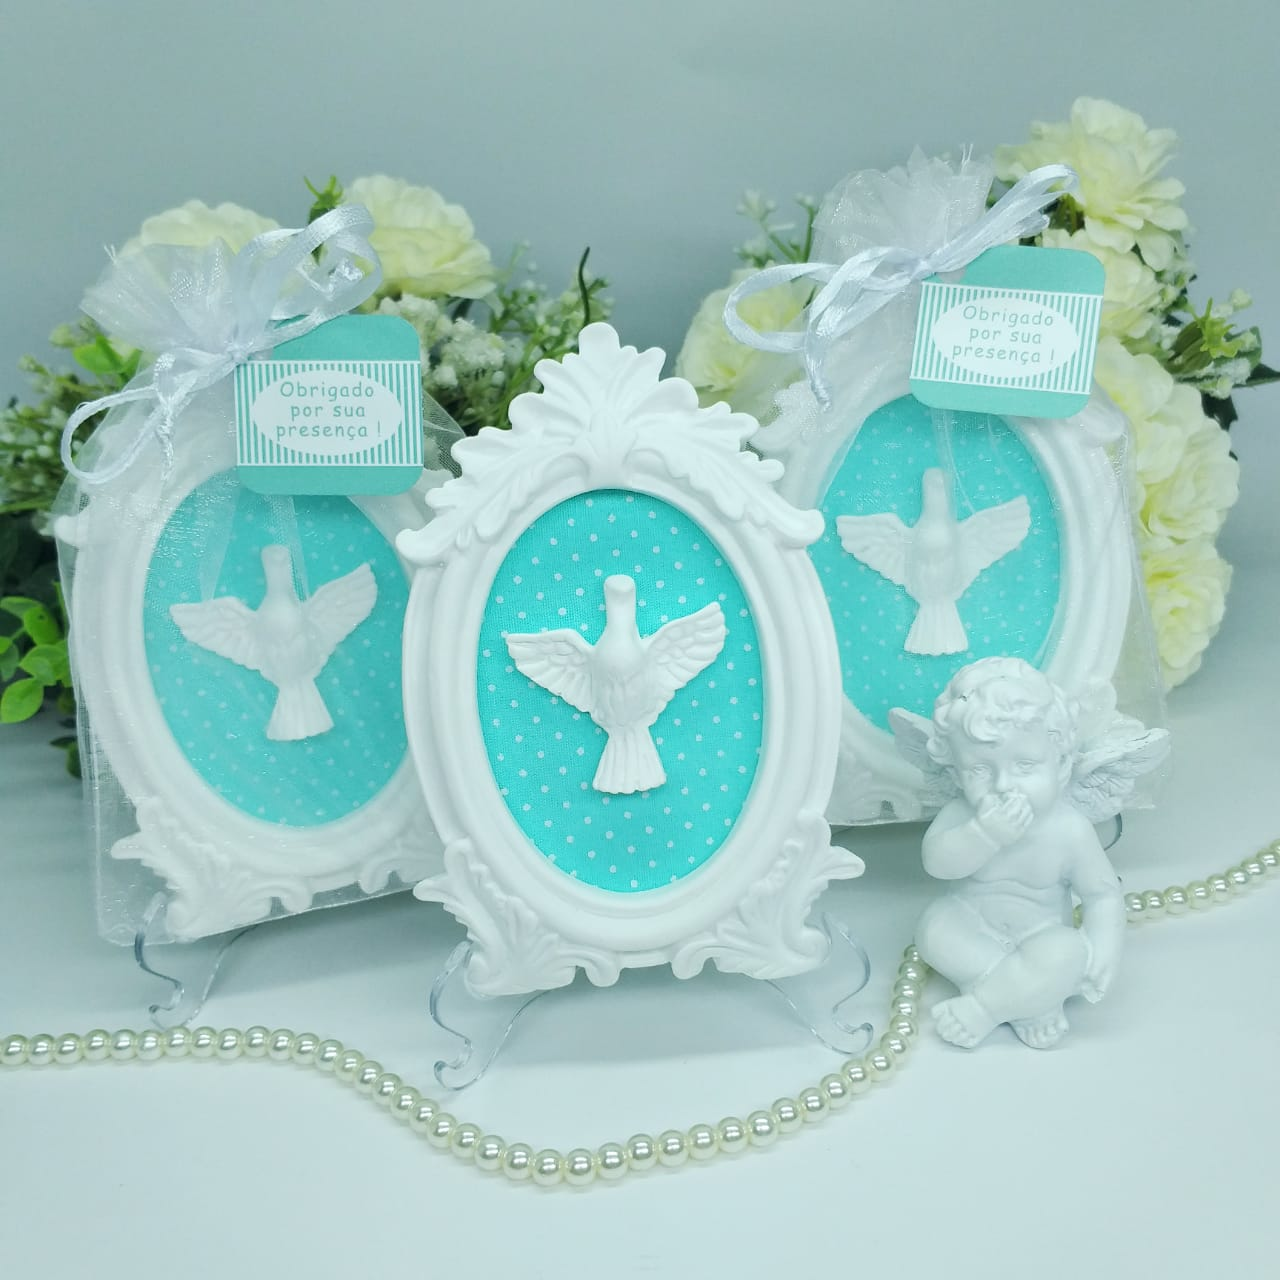 Kit 10 Lembrancinha Batizado Divino Espirito P Maternidade